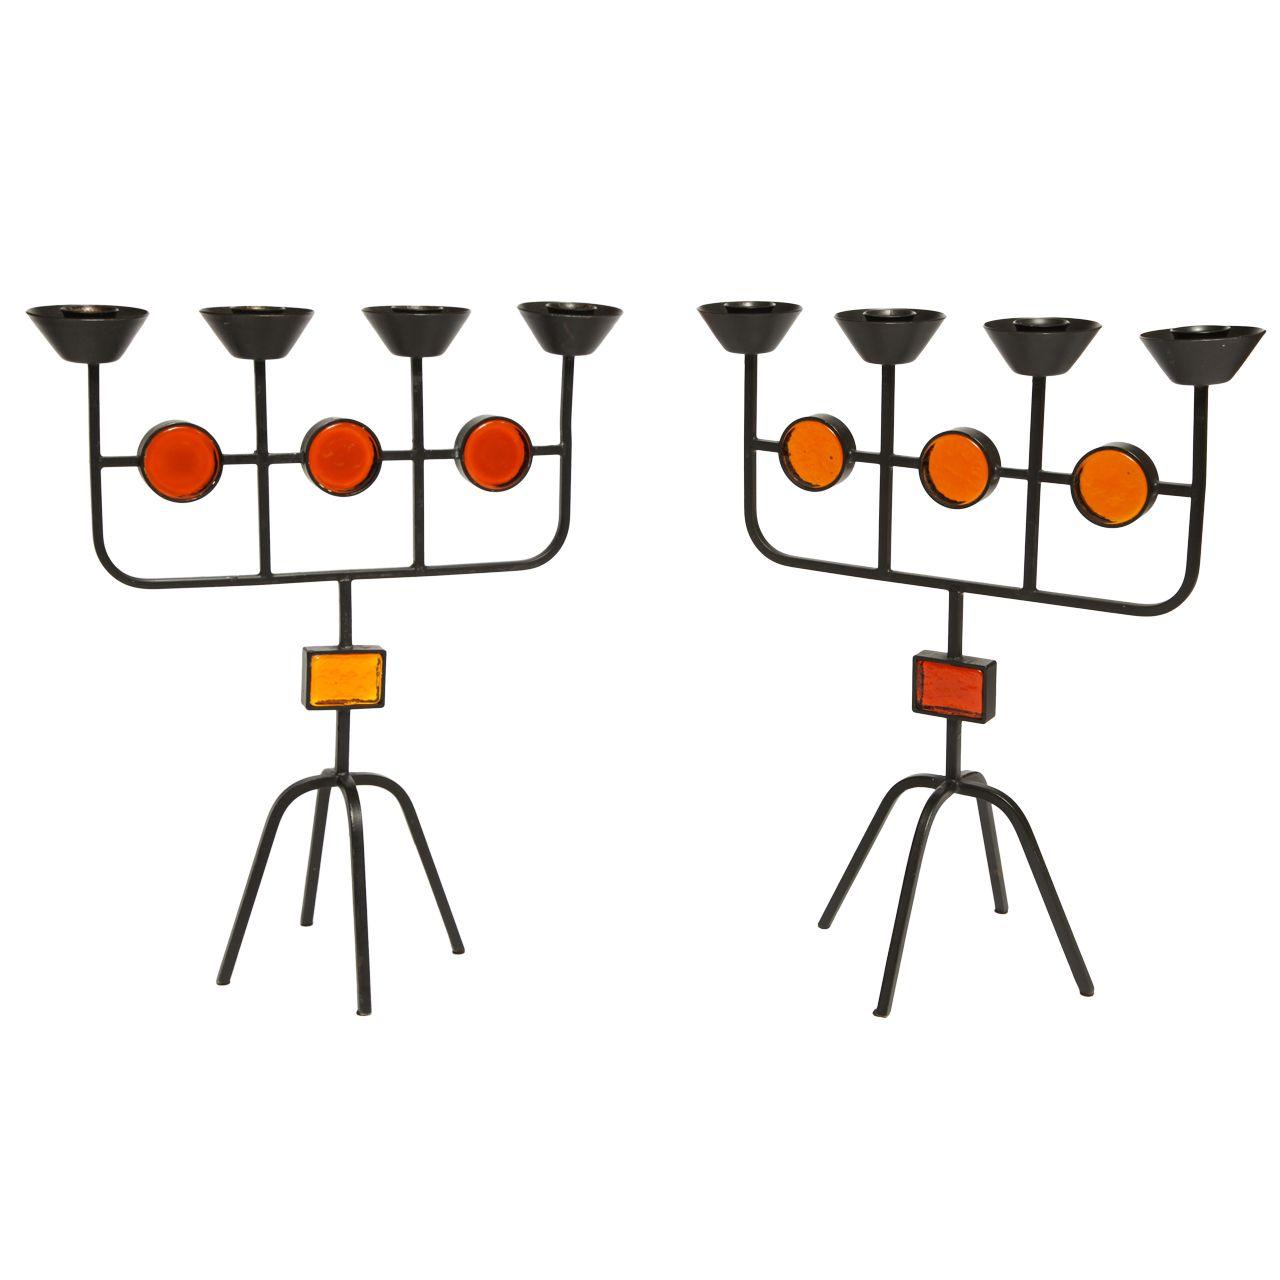 Pair of gunnar ander candelabras for ystad metal candelabra and metals